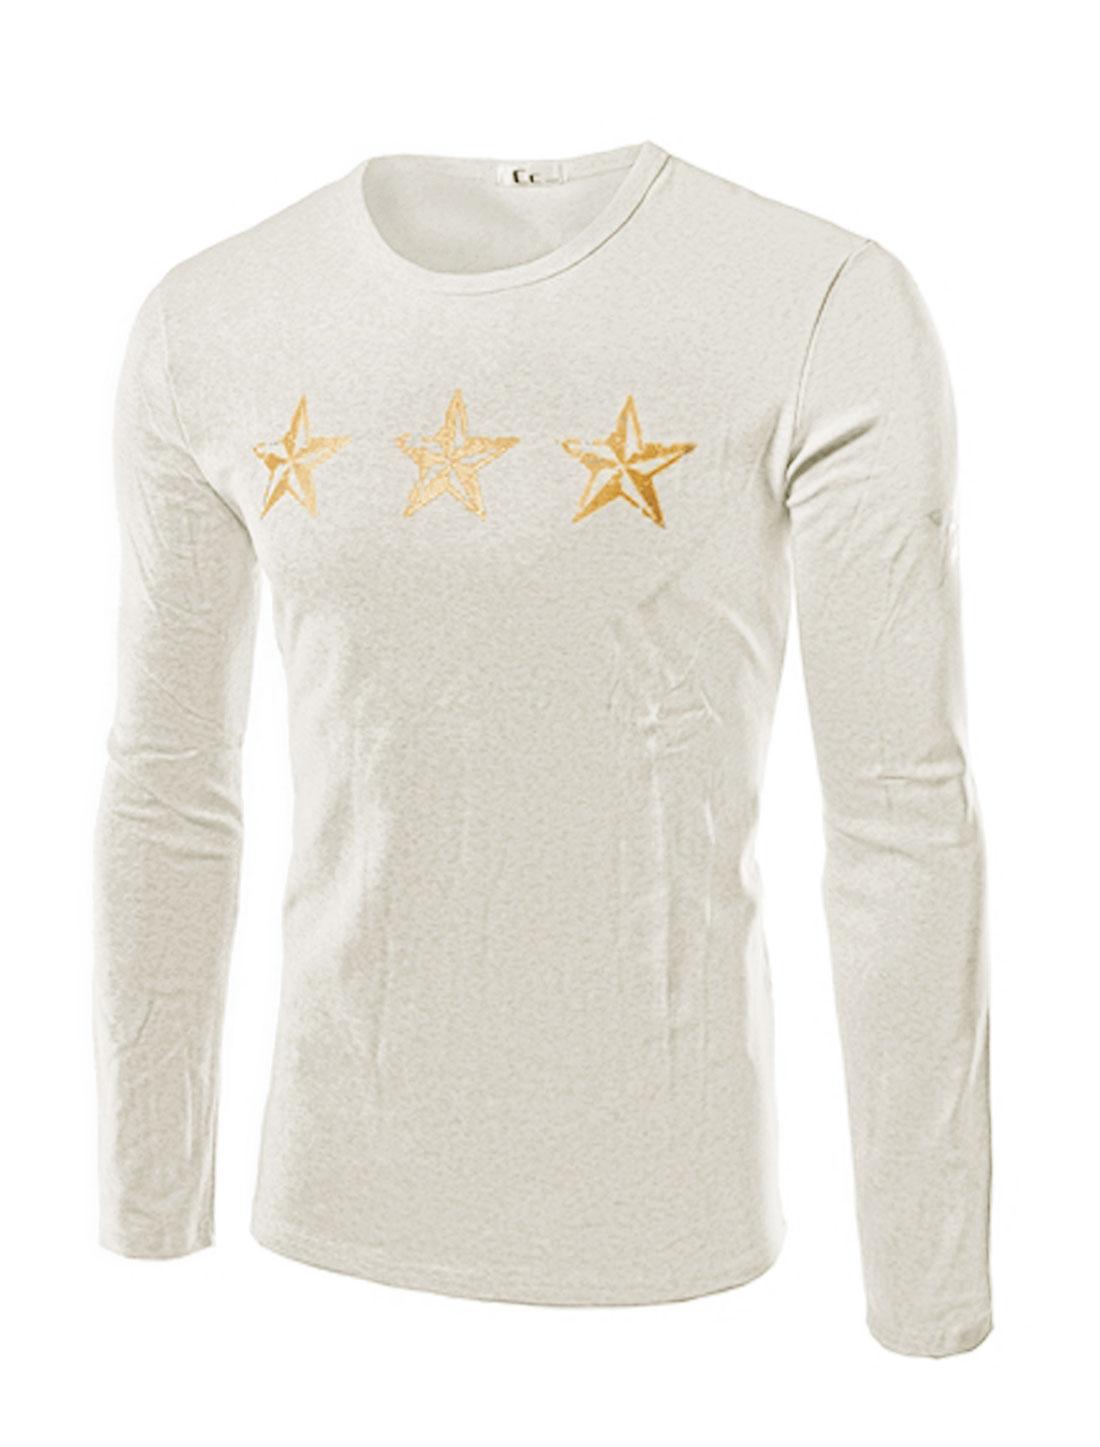 Men Crew Neck Stars Letters Slim Fit Tee Shirt Gray M